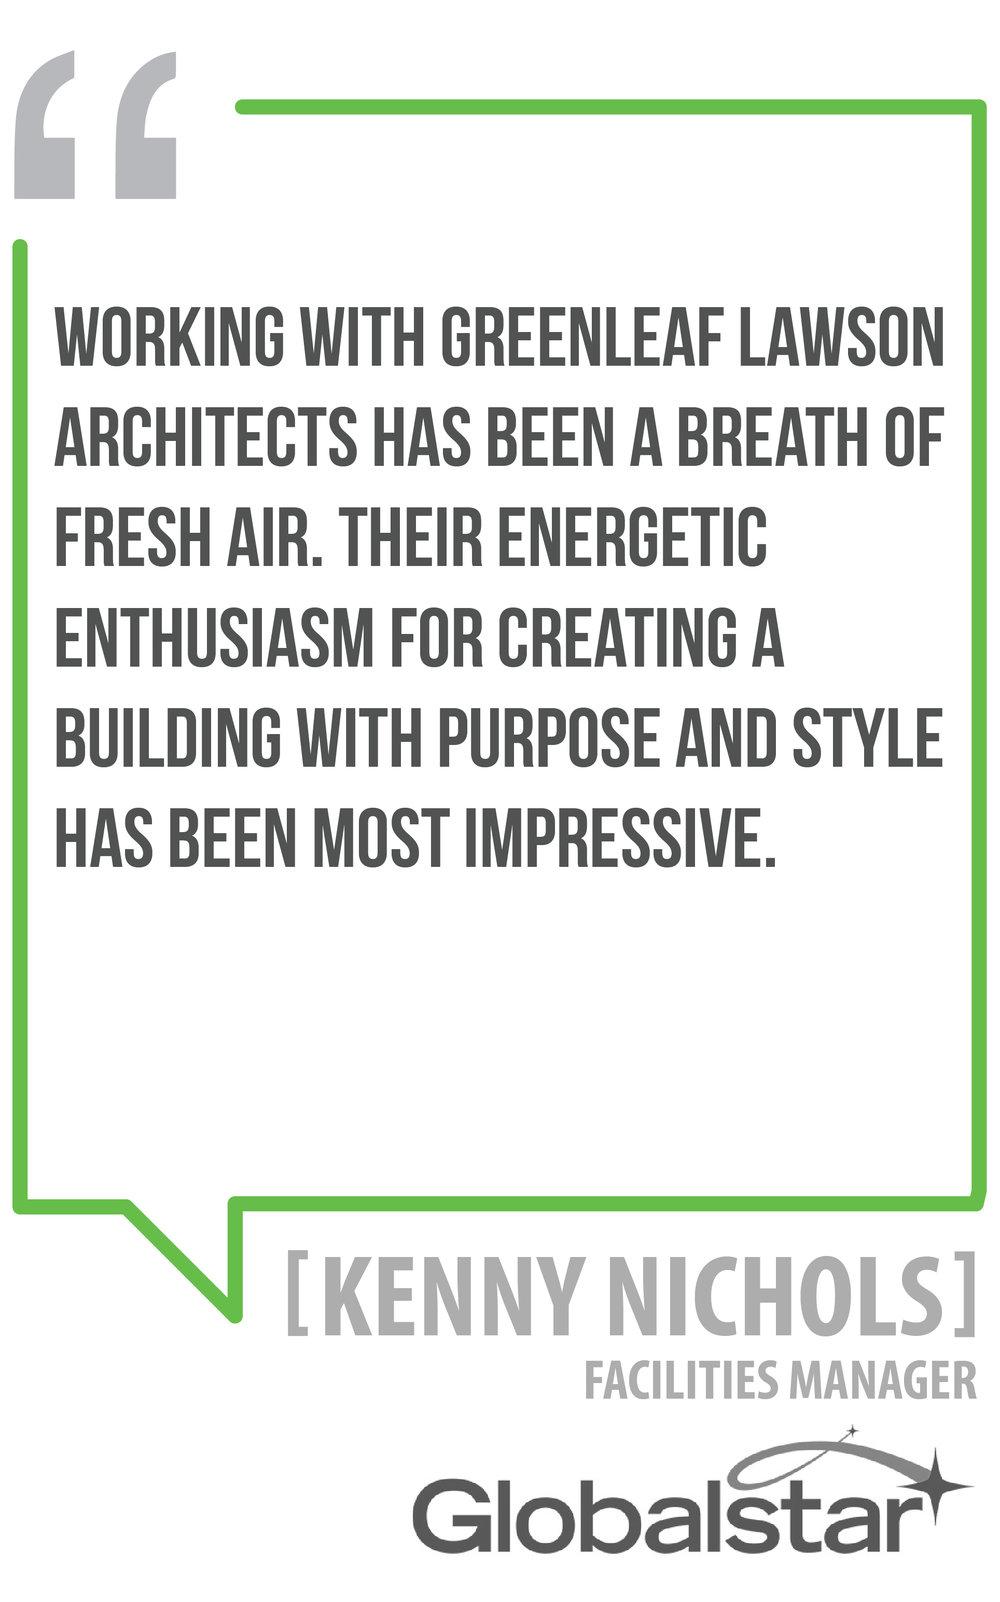 Greenleaf_Lawson_Architects-Testimonials-Square-01.jpg